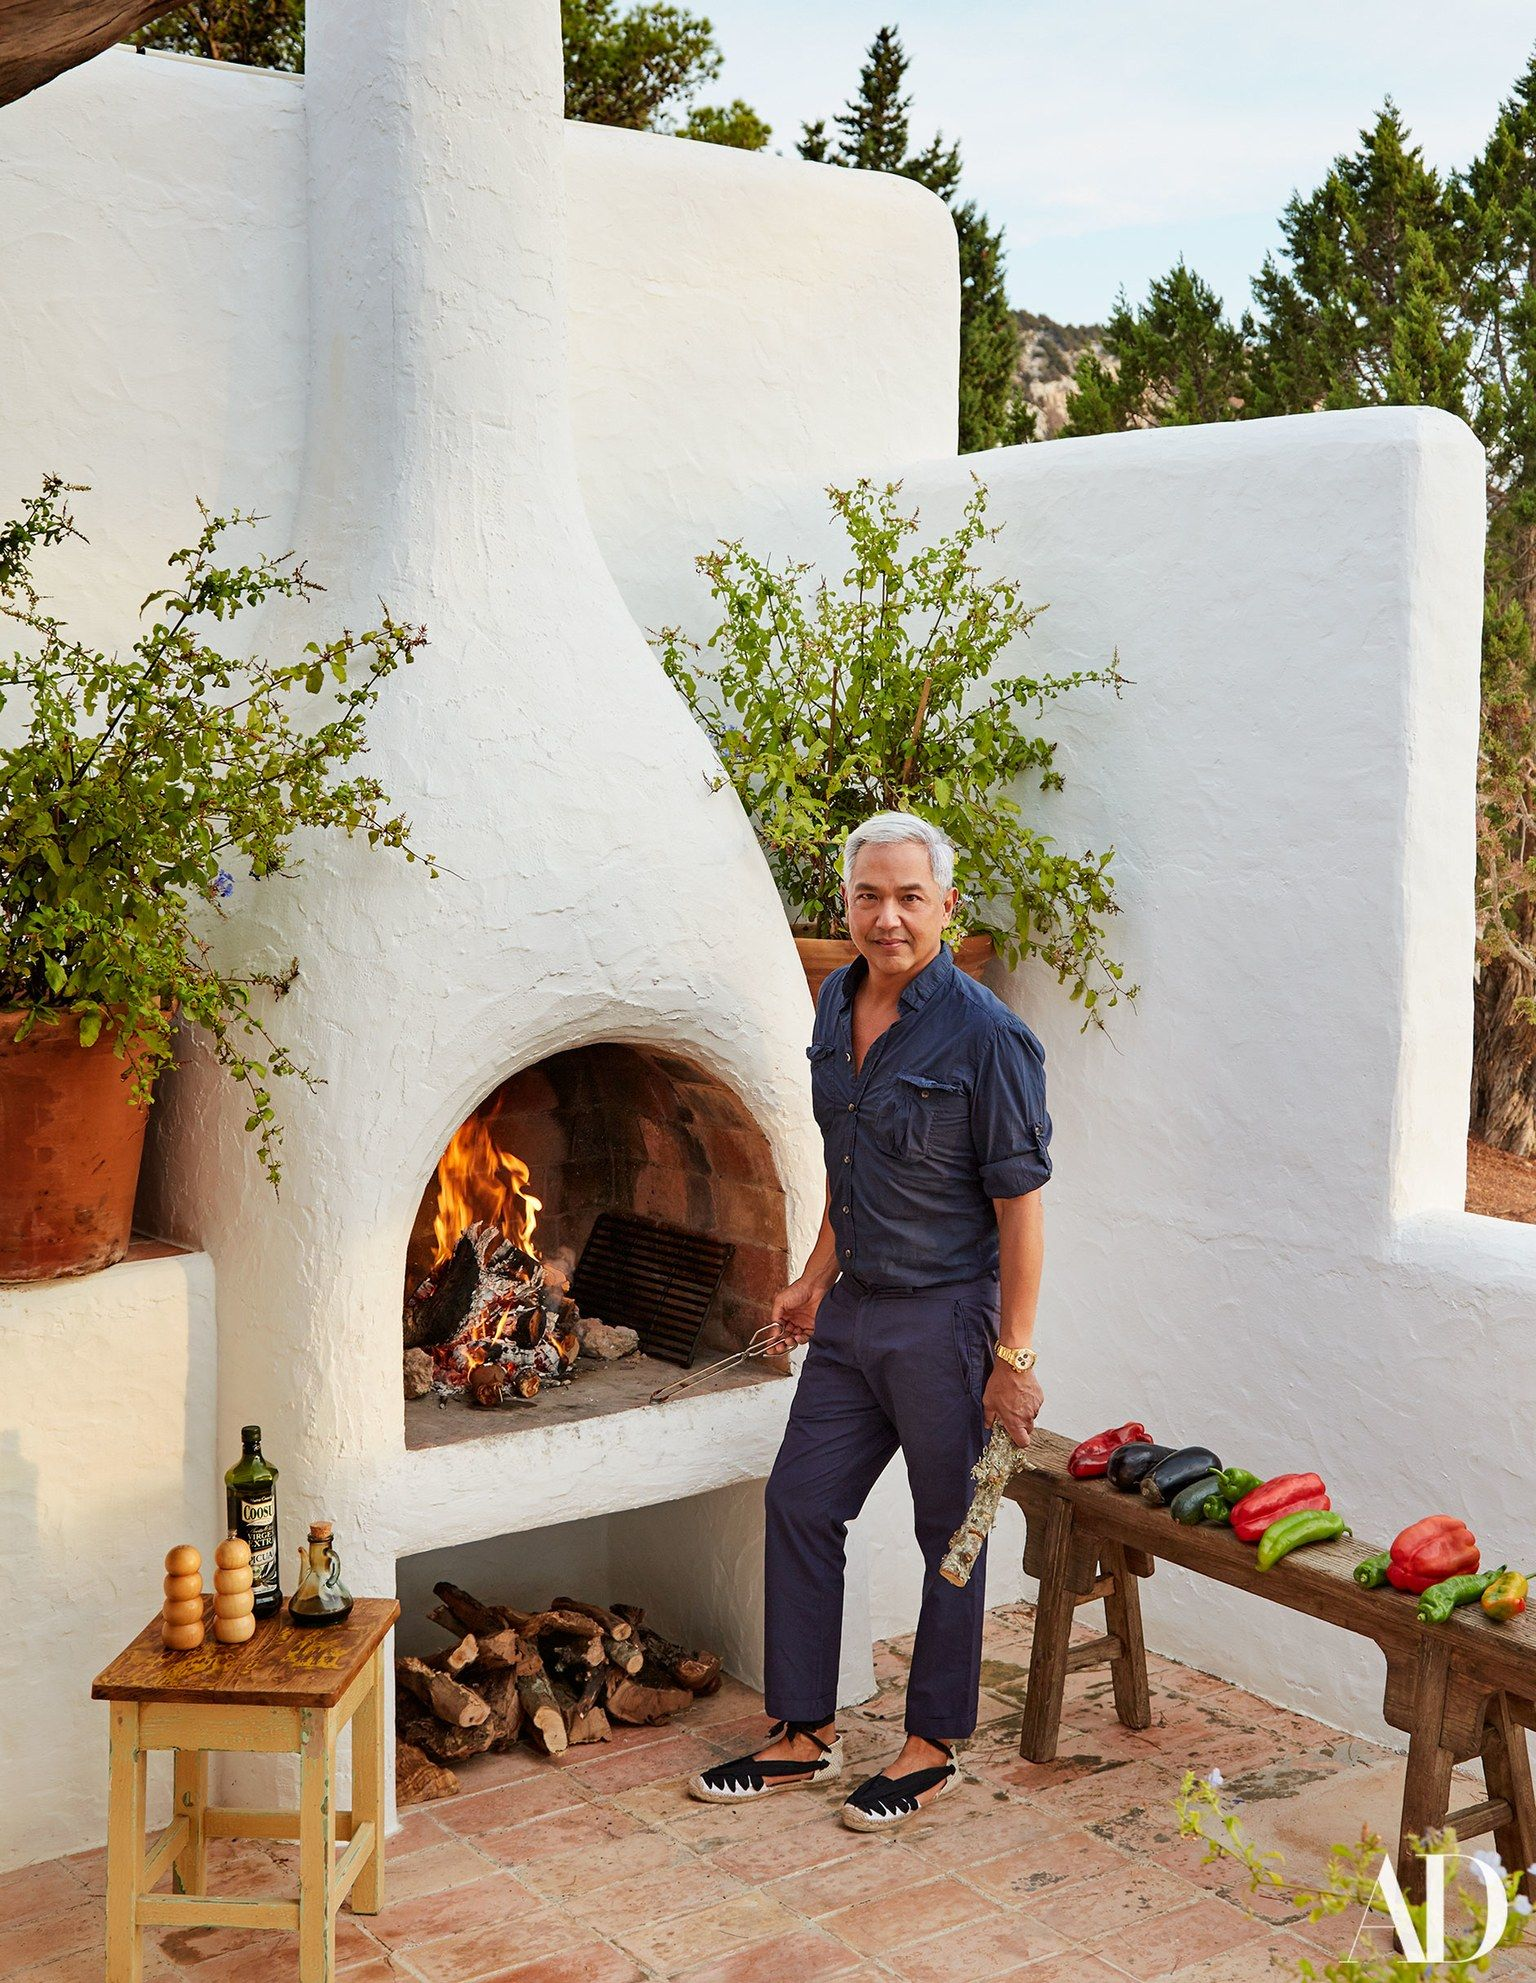 Escape to Daniel Romualdezs Oasis in Ibiza